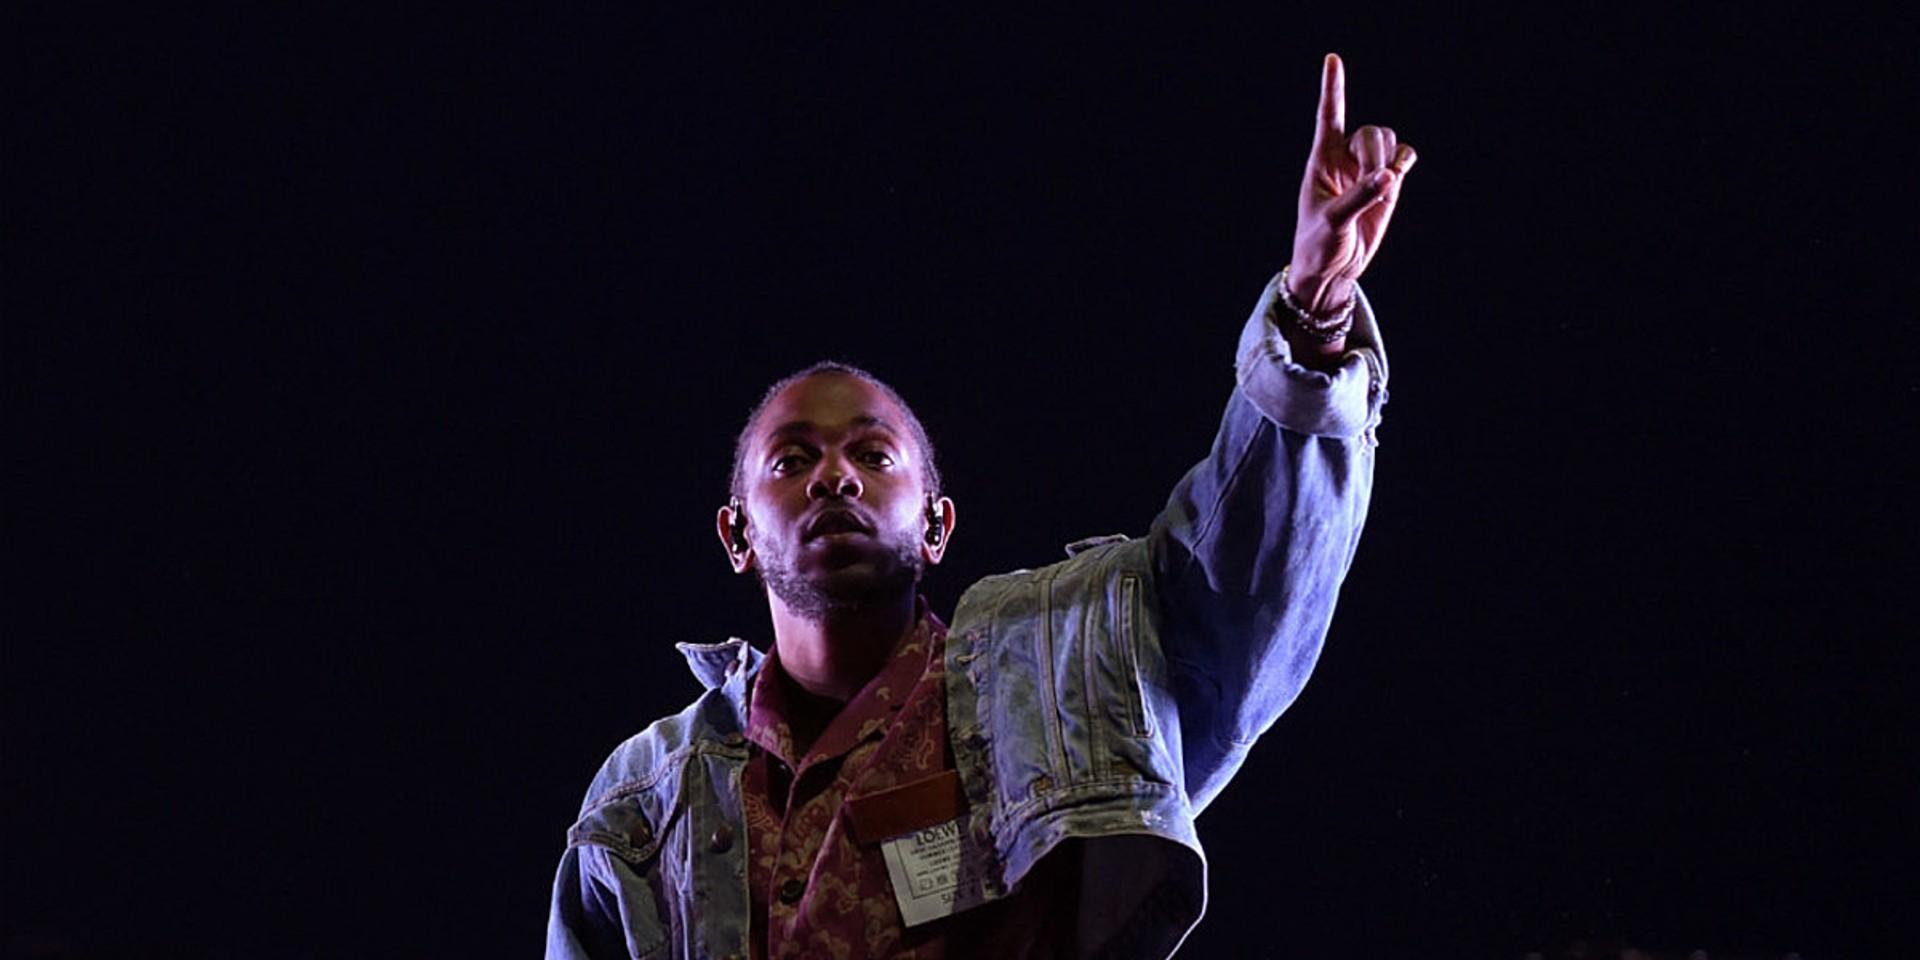 Kendrick Lamar has the longest-charting hip-hop album of all time